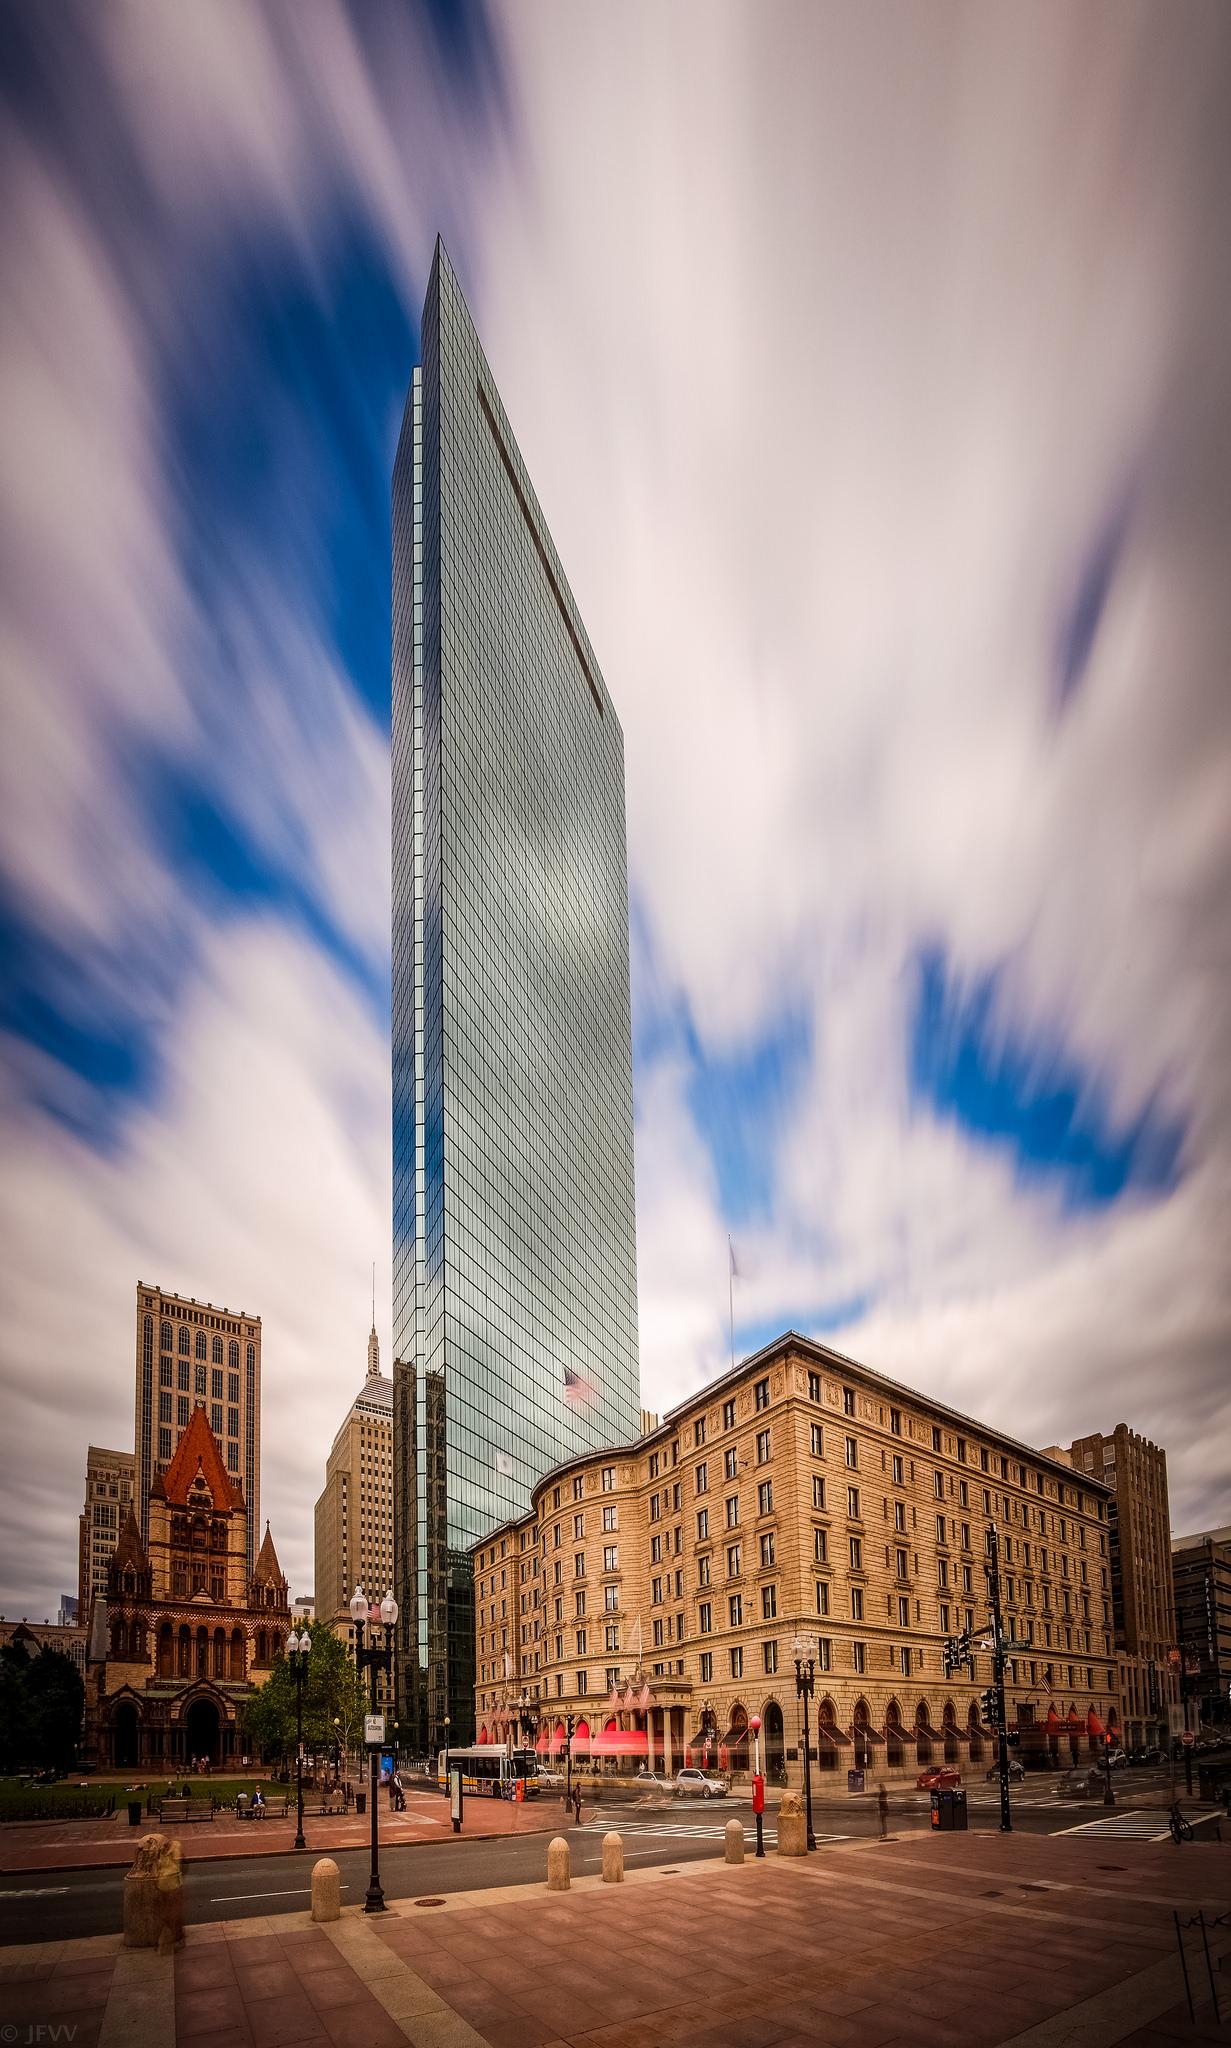 Long Exposure View of Boston's John Hancock Tower